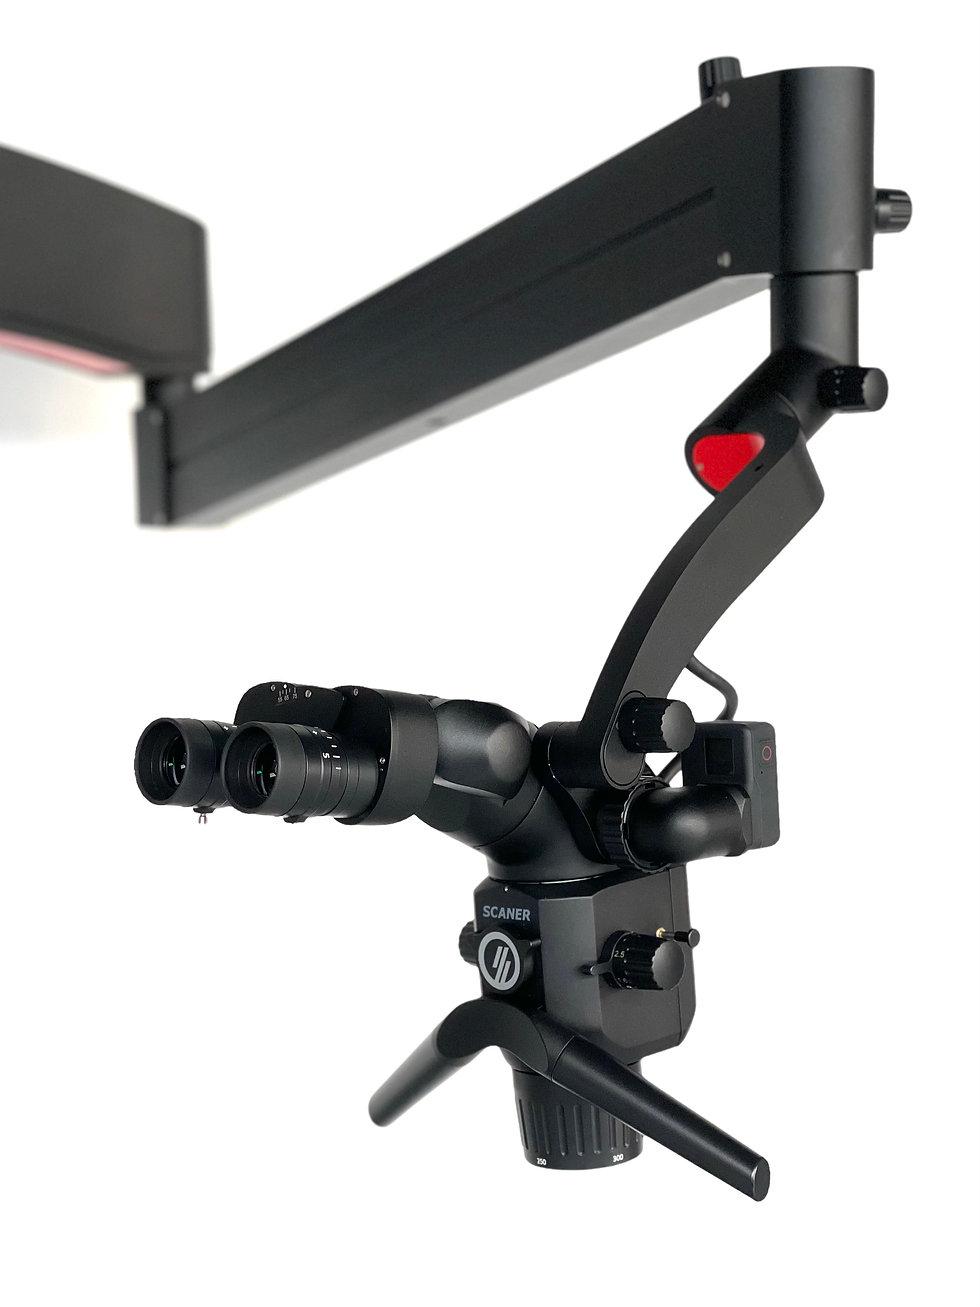 Dental microscope Wallstand - Microscope